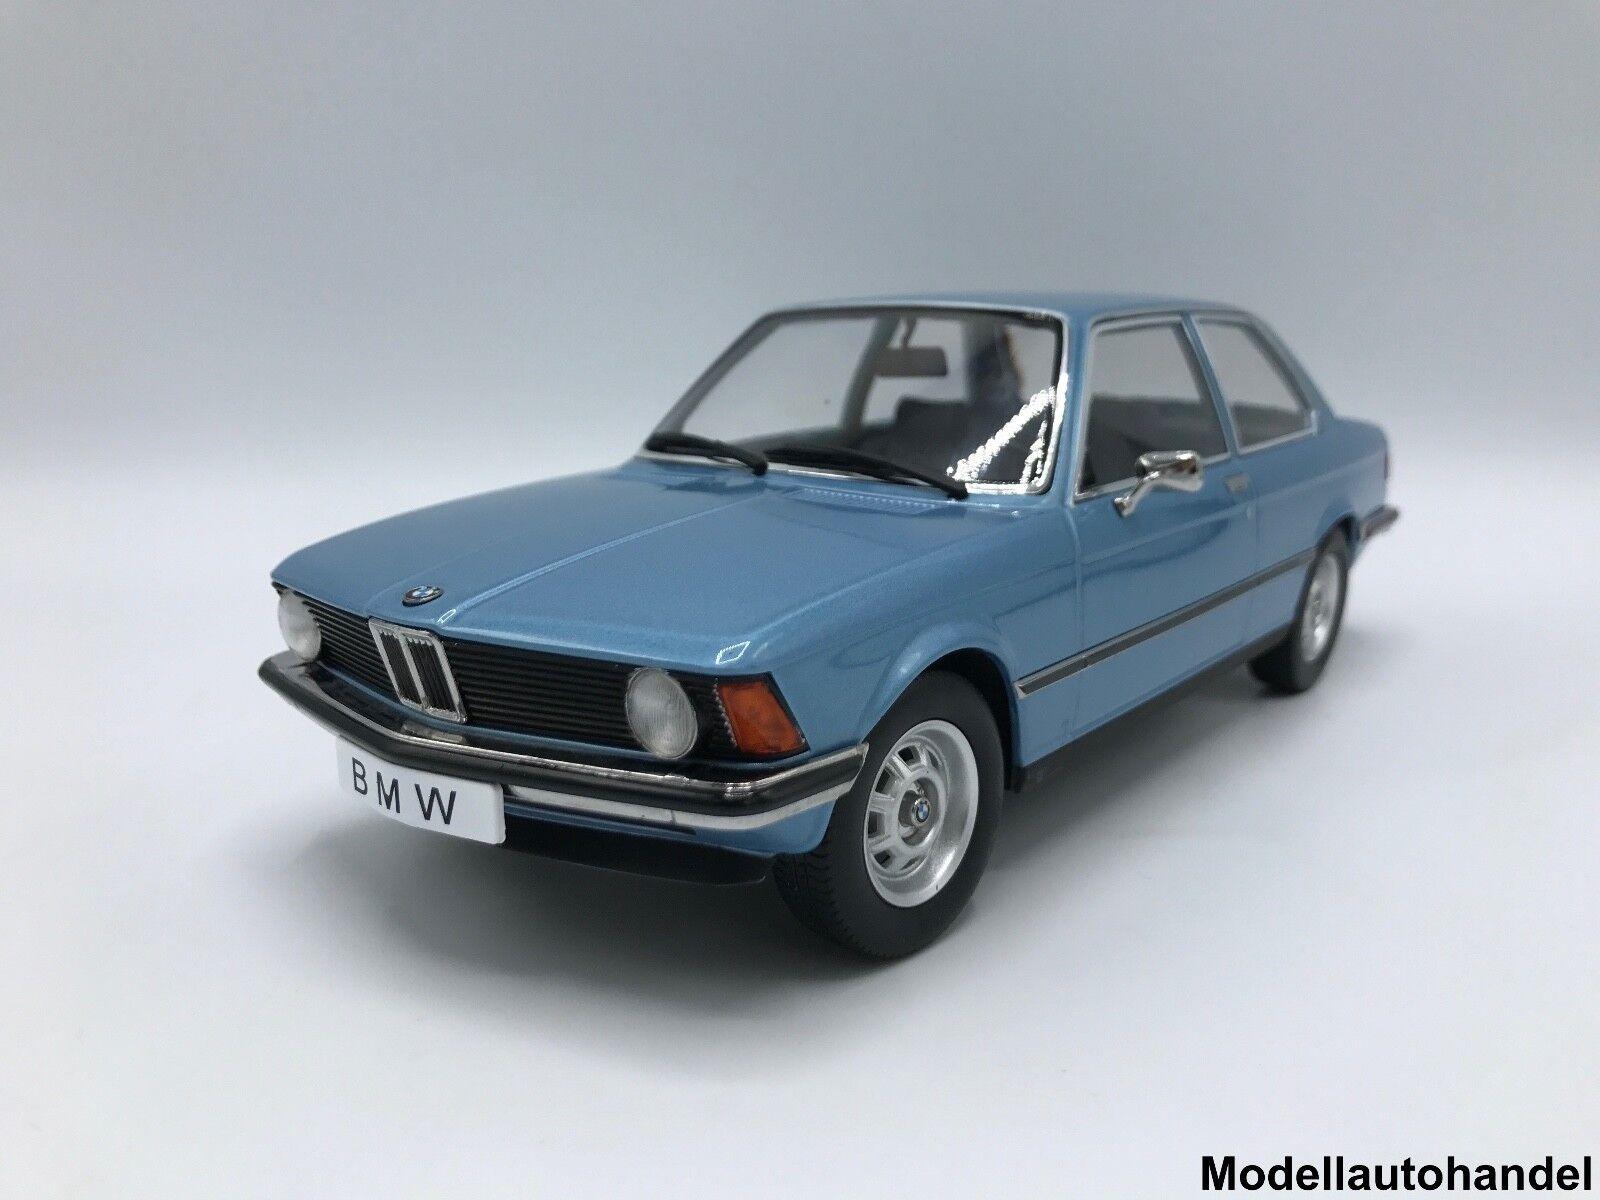 Bmw 318i e21 3er 1975 metallic-azul claro - 1 18 KK-Scale